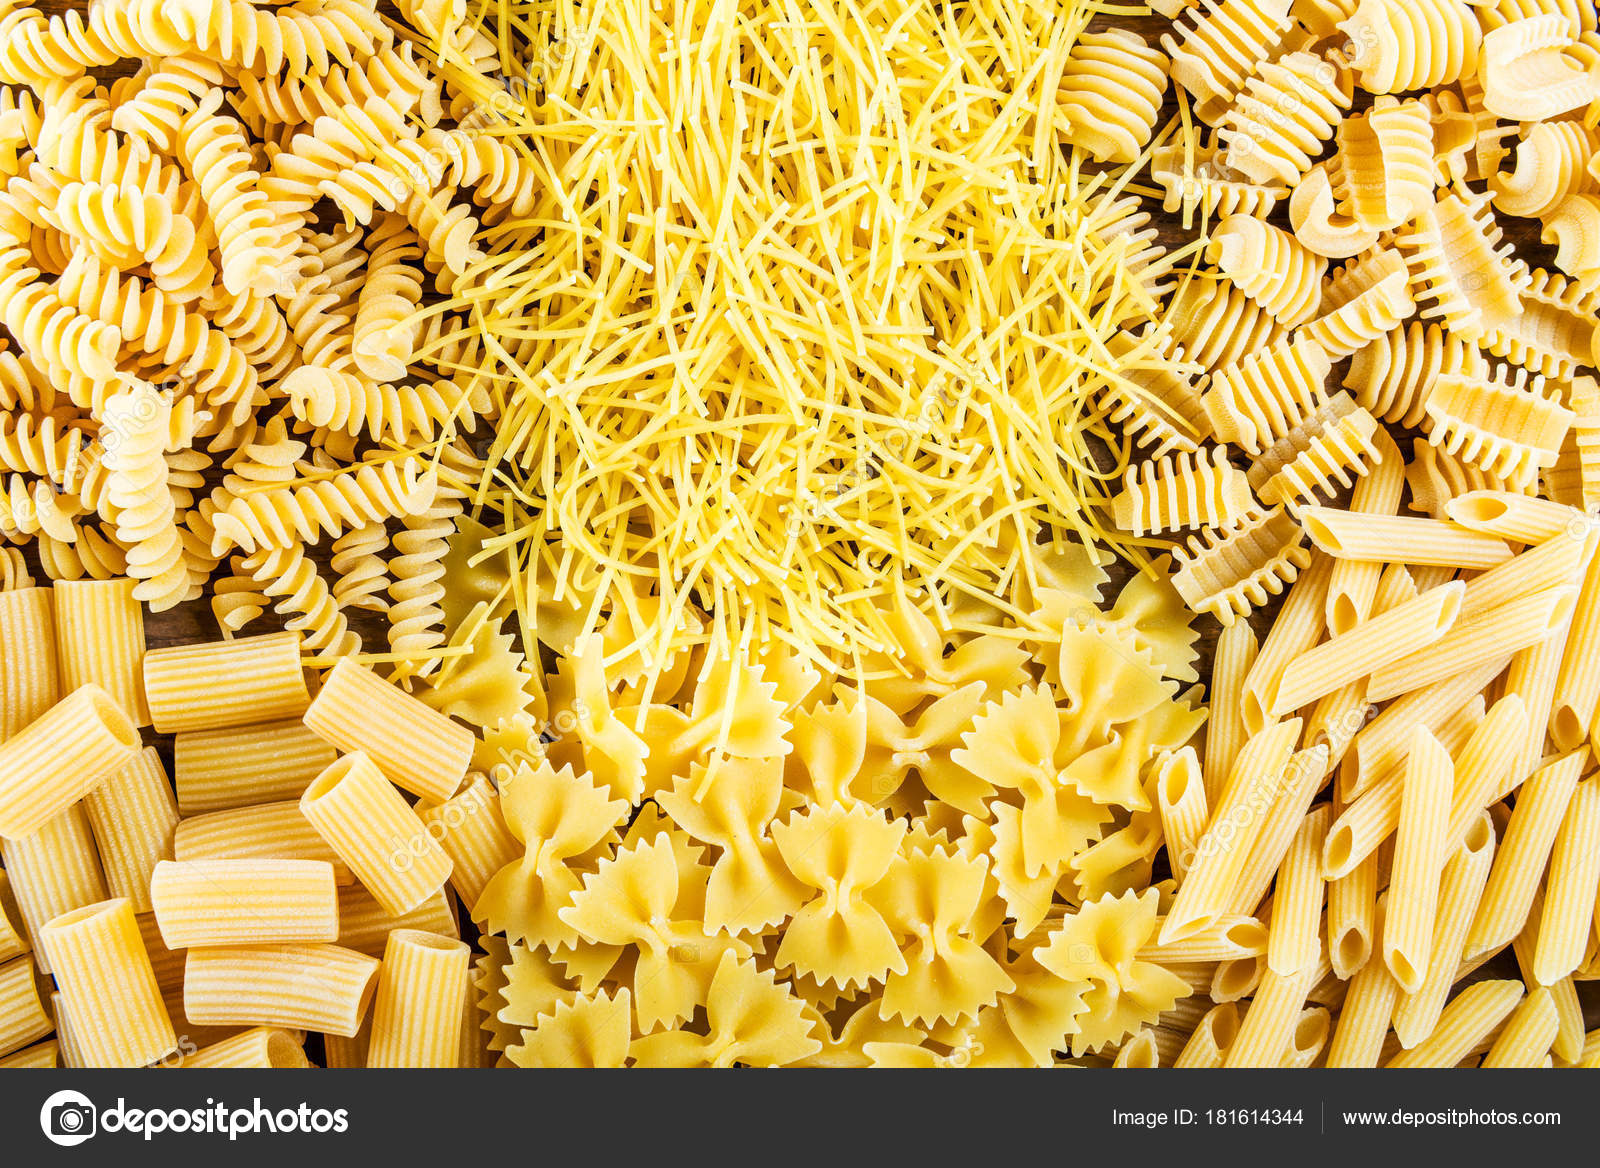 Diversi tipi di pasta cruda foto stock manuta 181614344 - Diversi tipi di figa ...